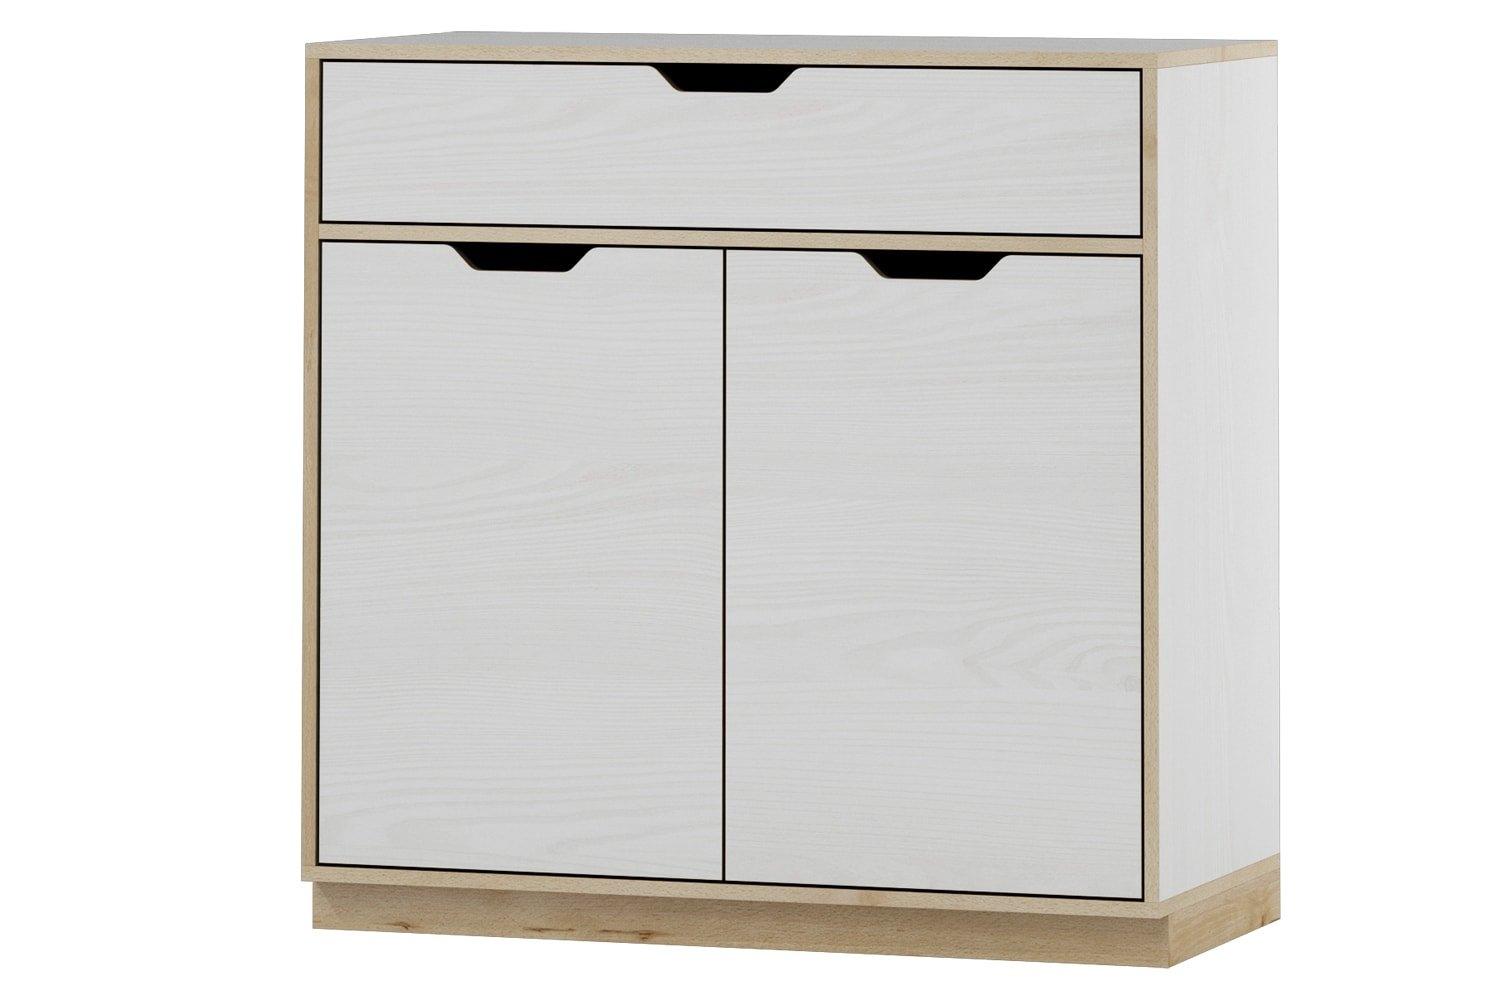 Cabinet din pal cu 1 sertar si 2 usi Happy 10 White / Beech l89xA41xH88 cm